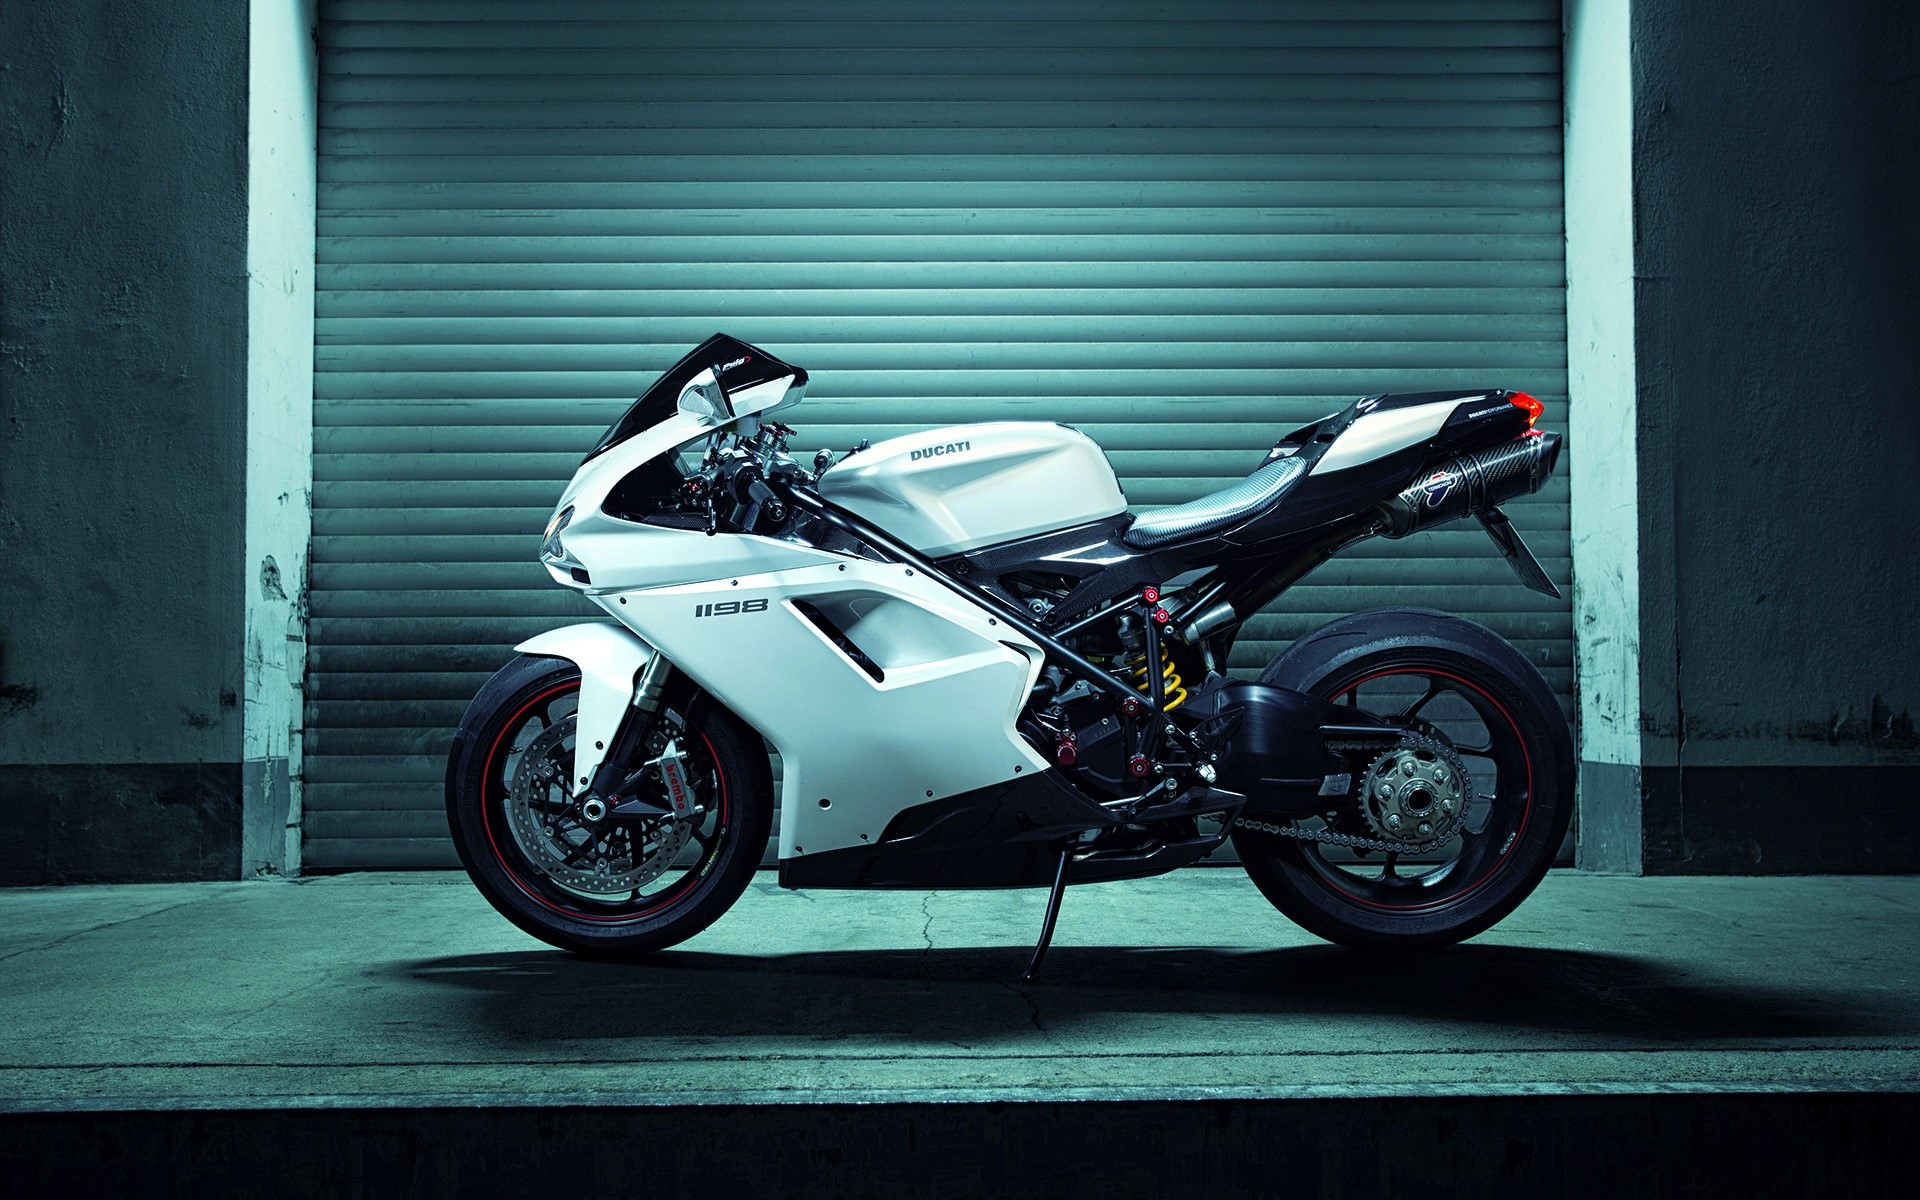 Fondo de pantalla de Ducati 1198 Superbike Imágenes